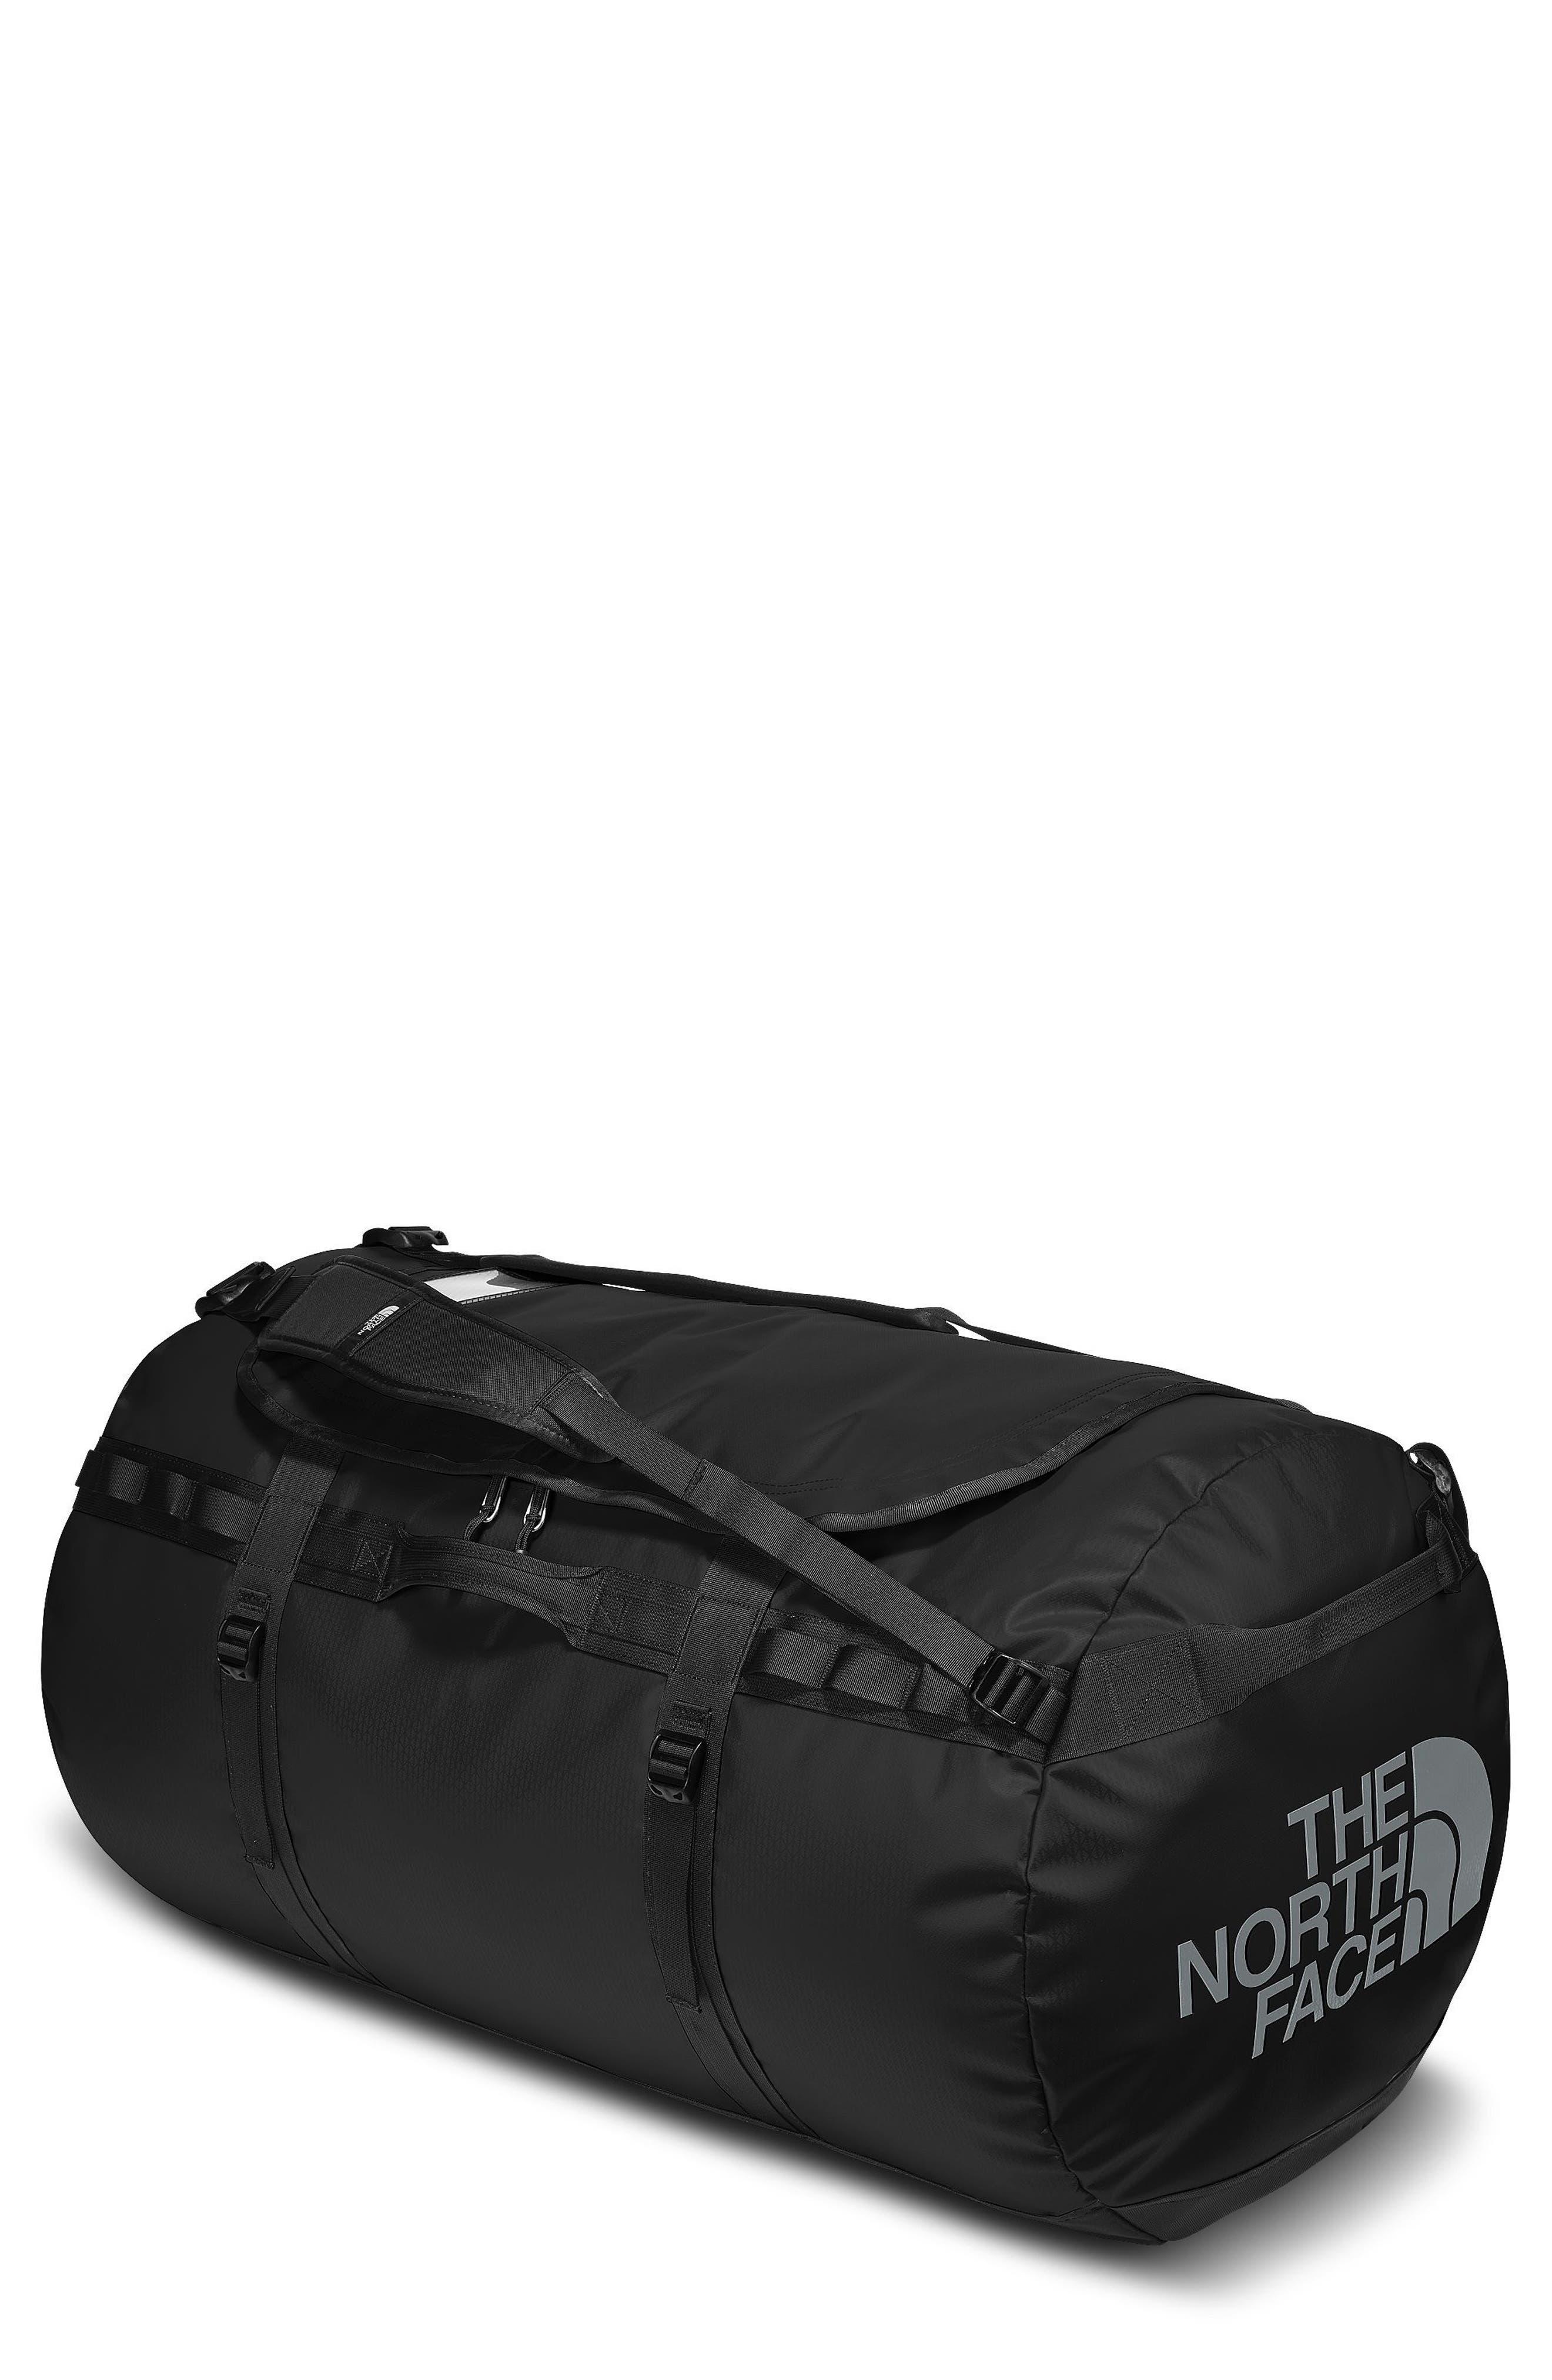 Base Camp XXL Duffel Bag,                         Main,                         color, Tnf Black